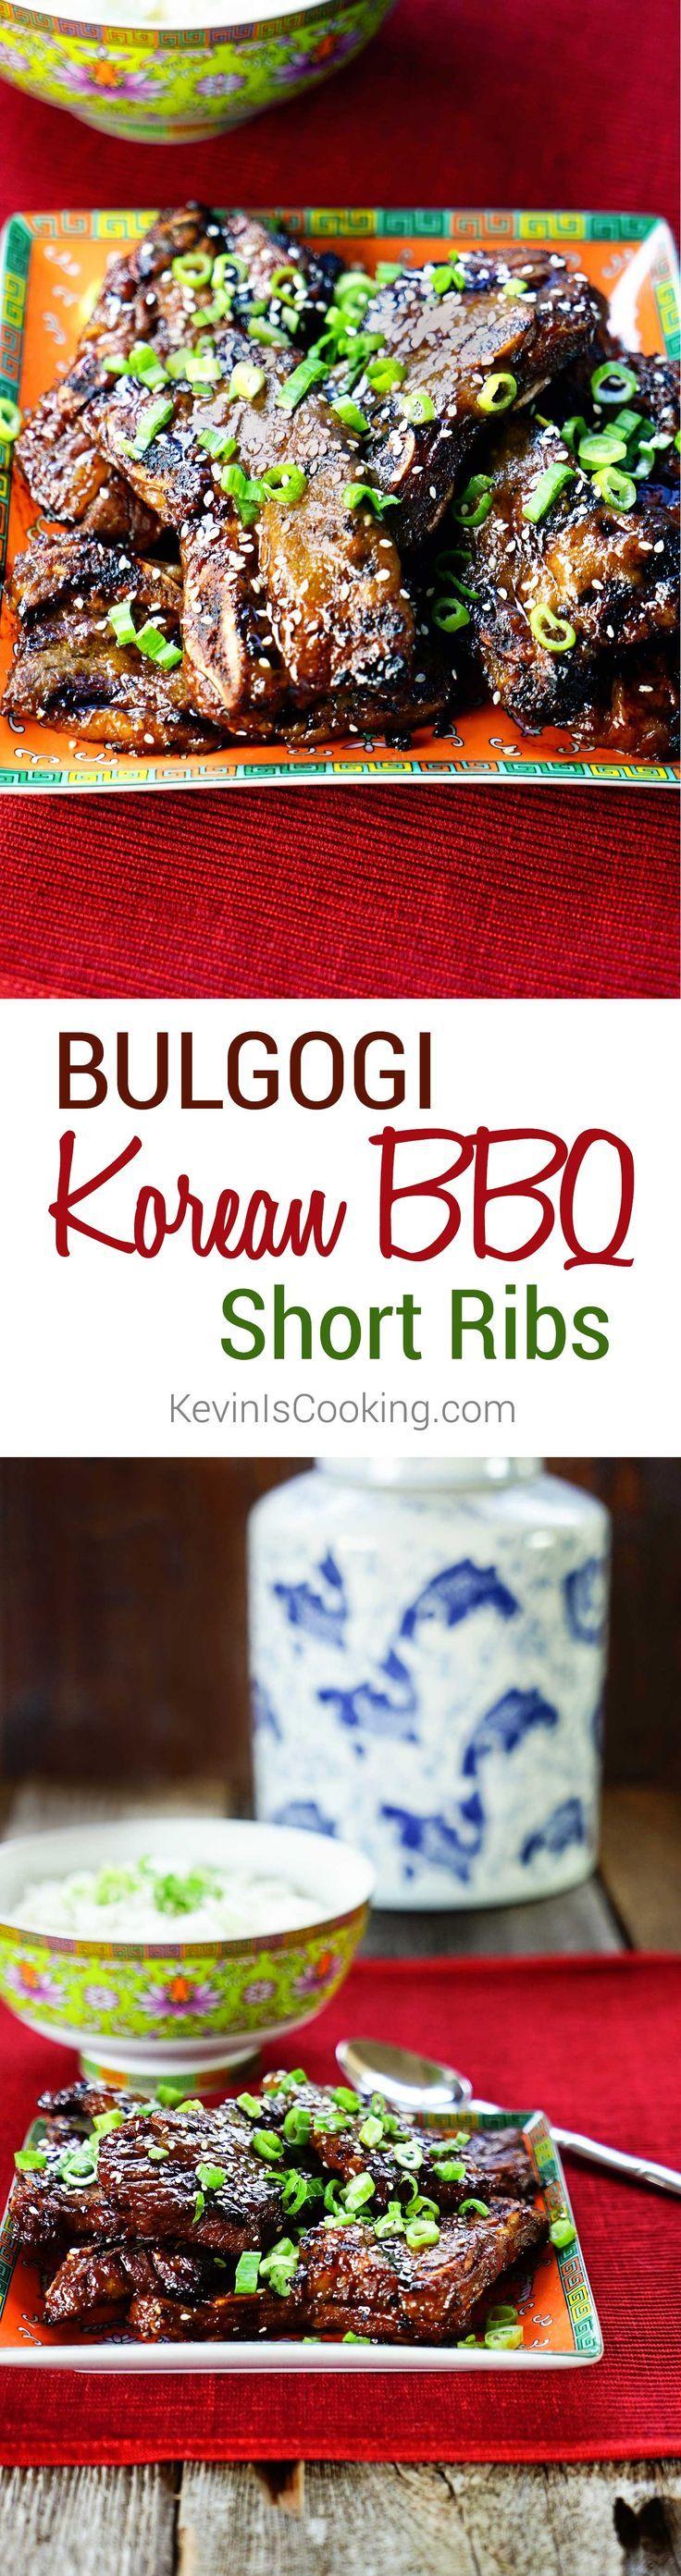 Bulgogi Korean BBQ Short Ribs. www.keviniscookin...